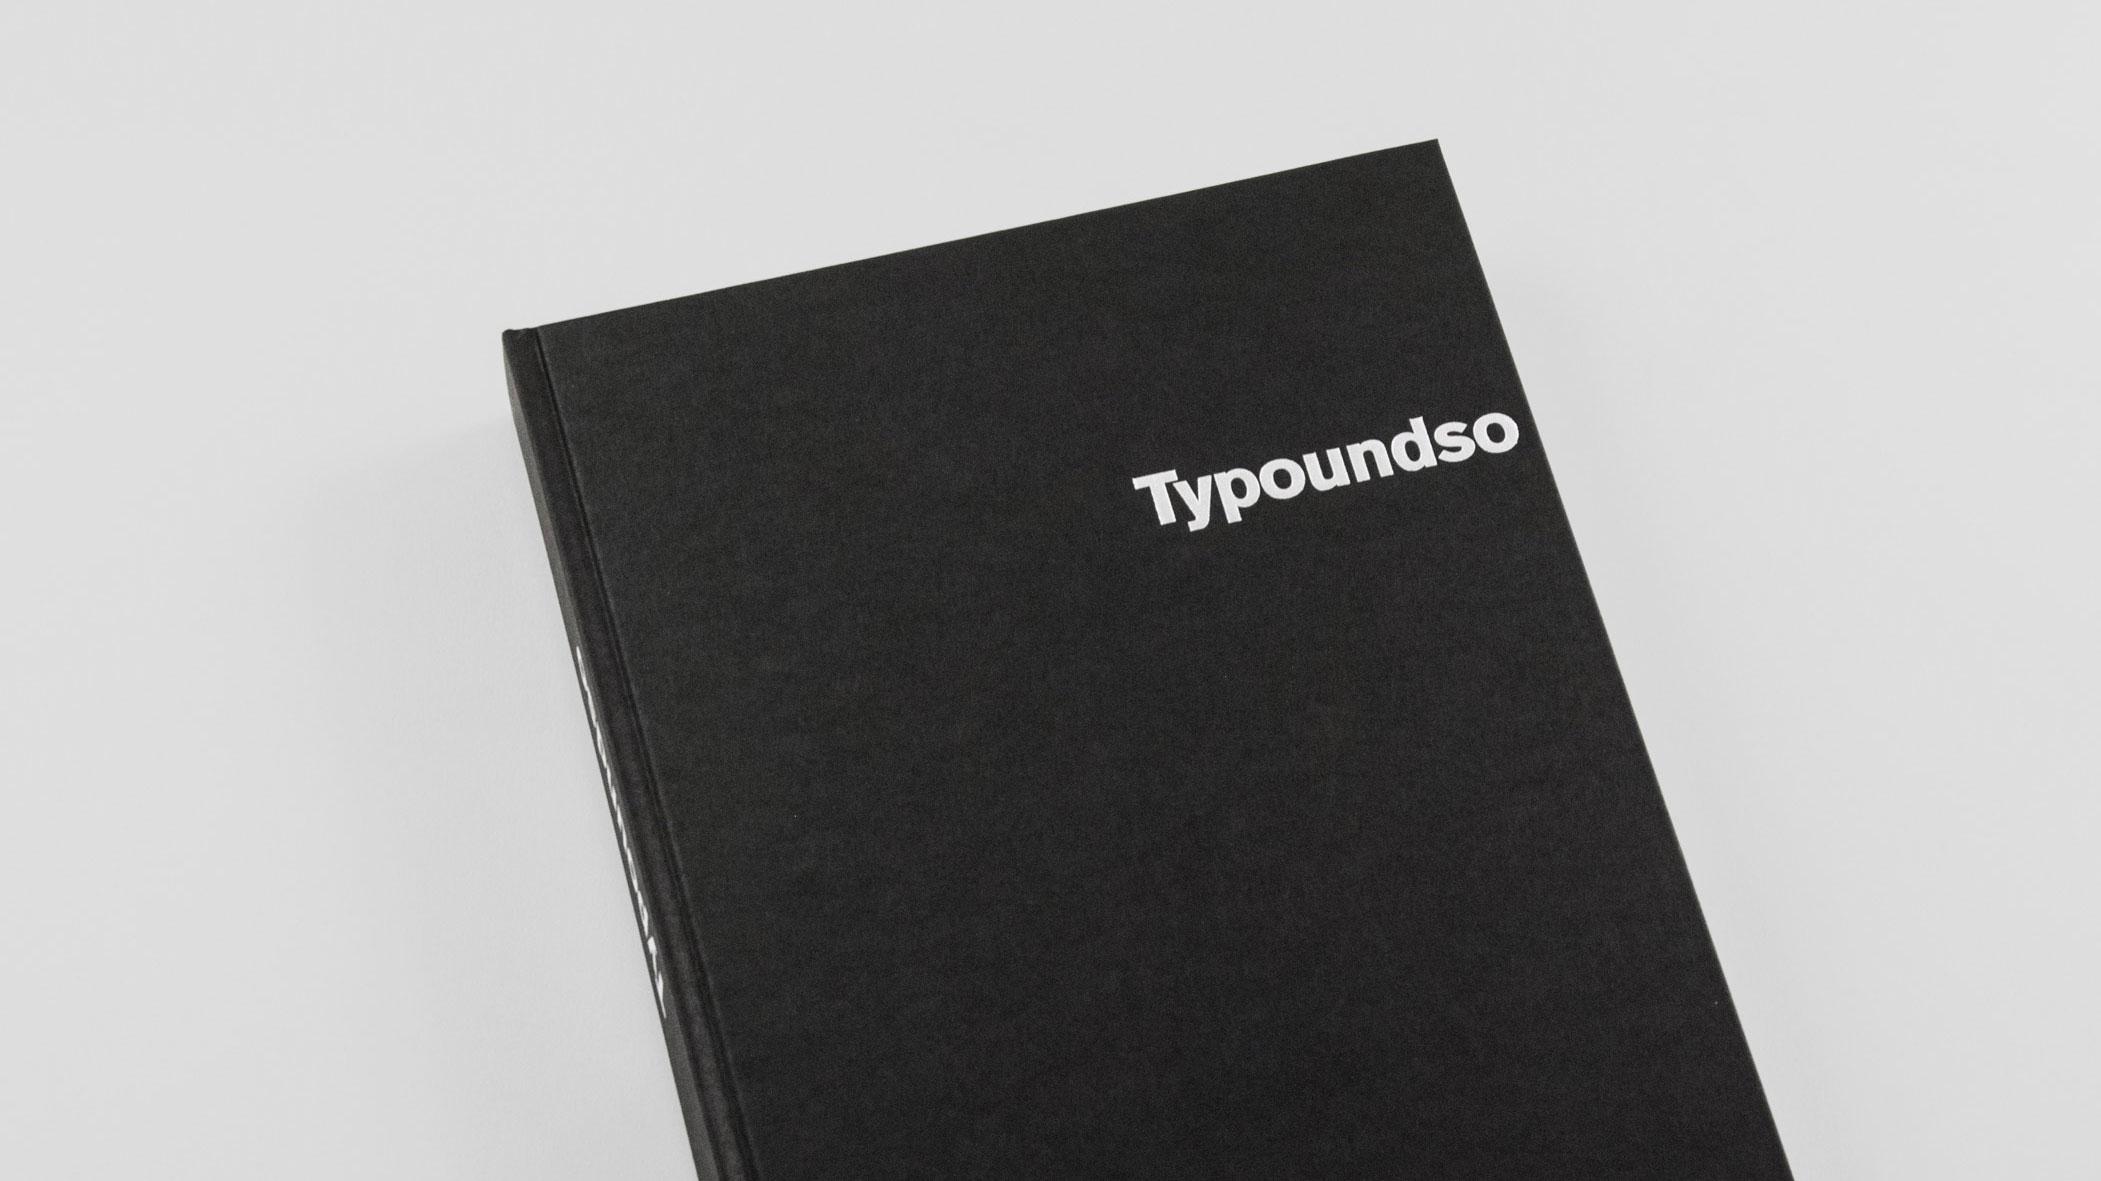 equipe visuelle edition typoundso verlag tyspoundso hans-rudolf lutz